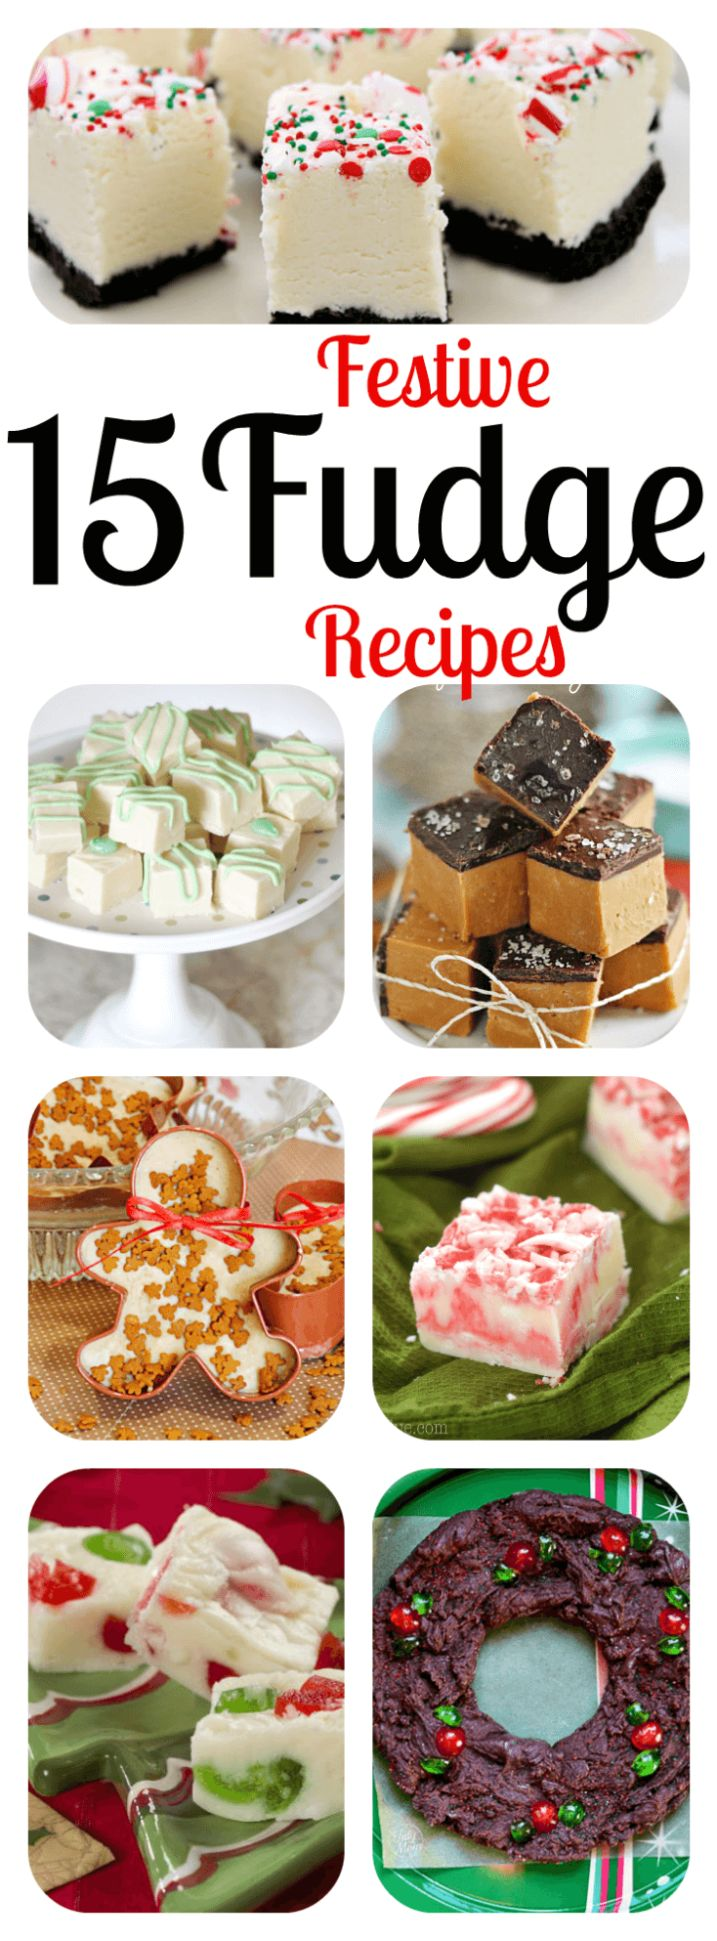 Christmas Fudge: 15 Festive Holiday Fudge RecipesLetters from Santa Blog